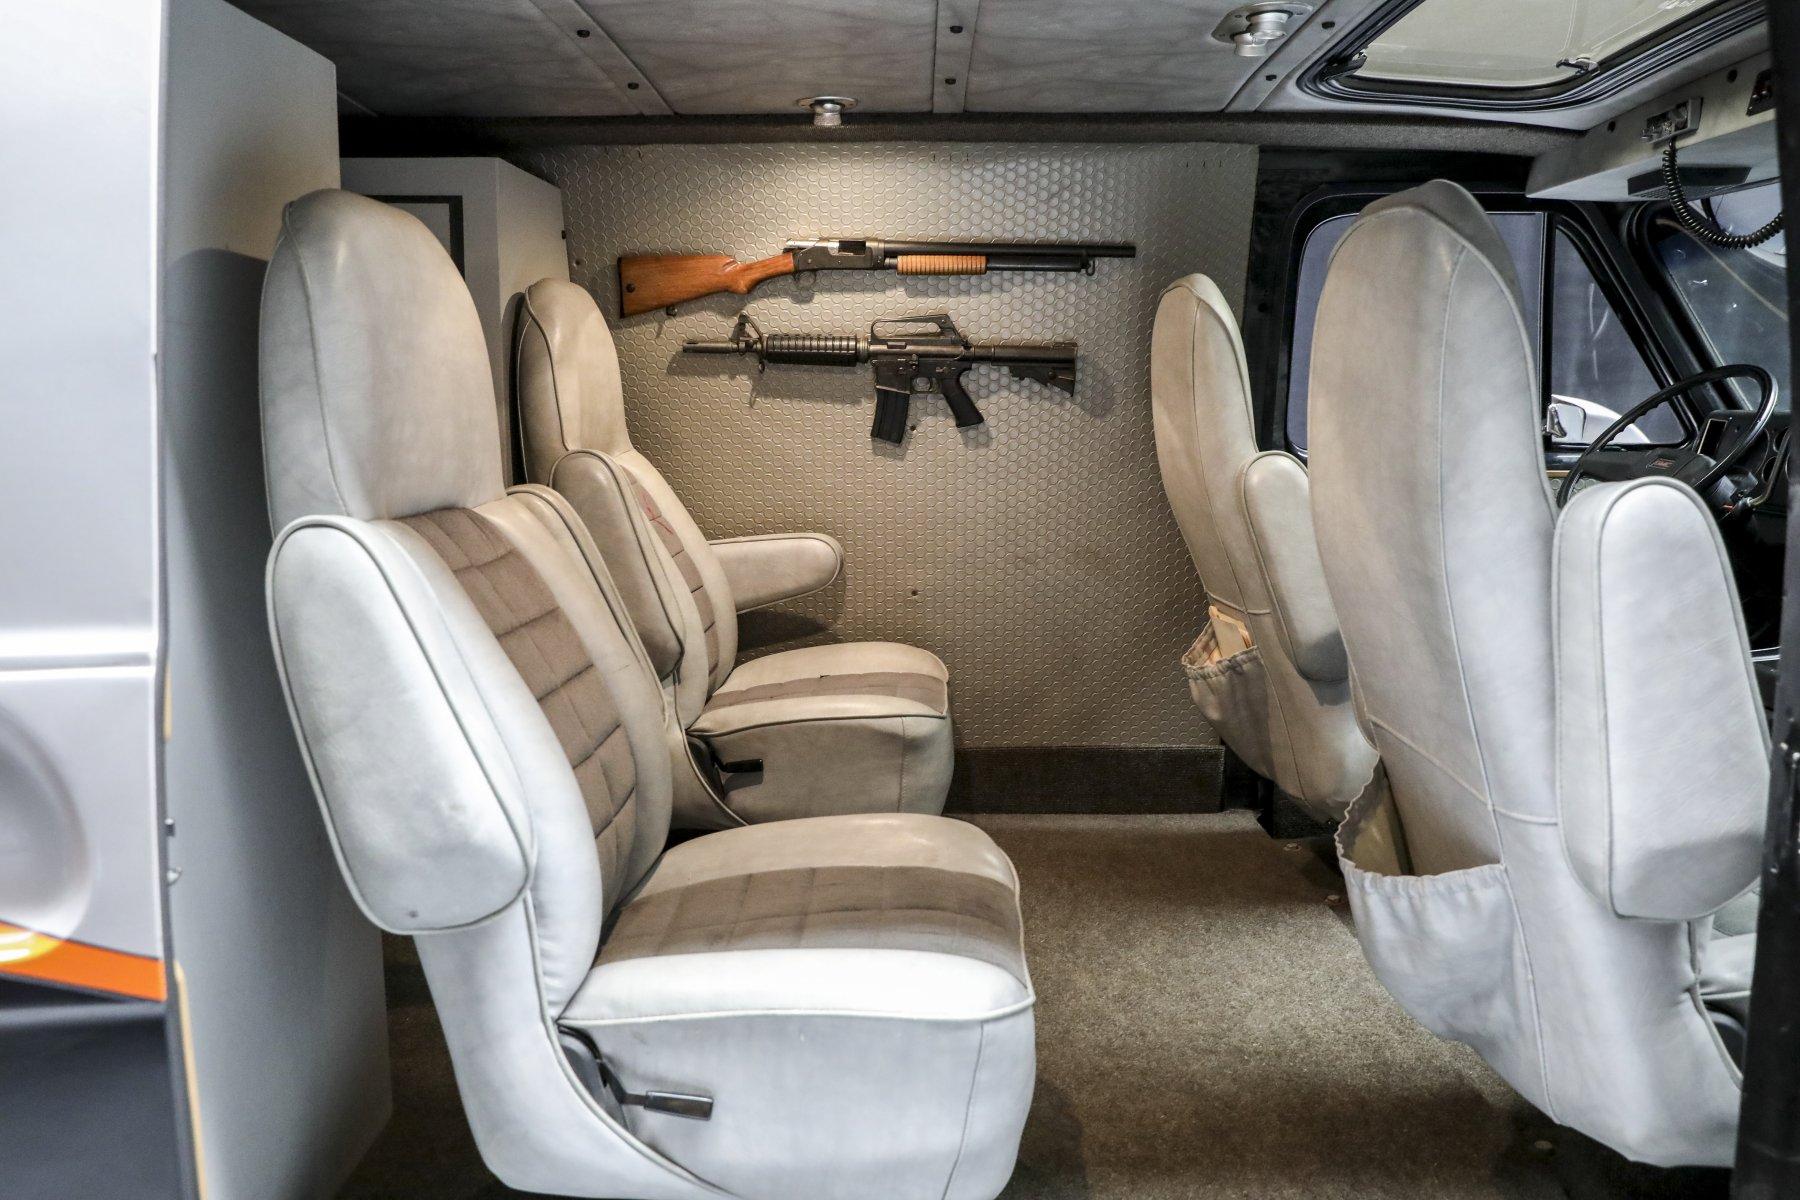 A-Team GMC G-Series 83 Van interior passengers